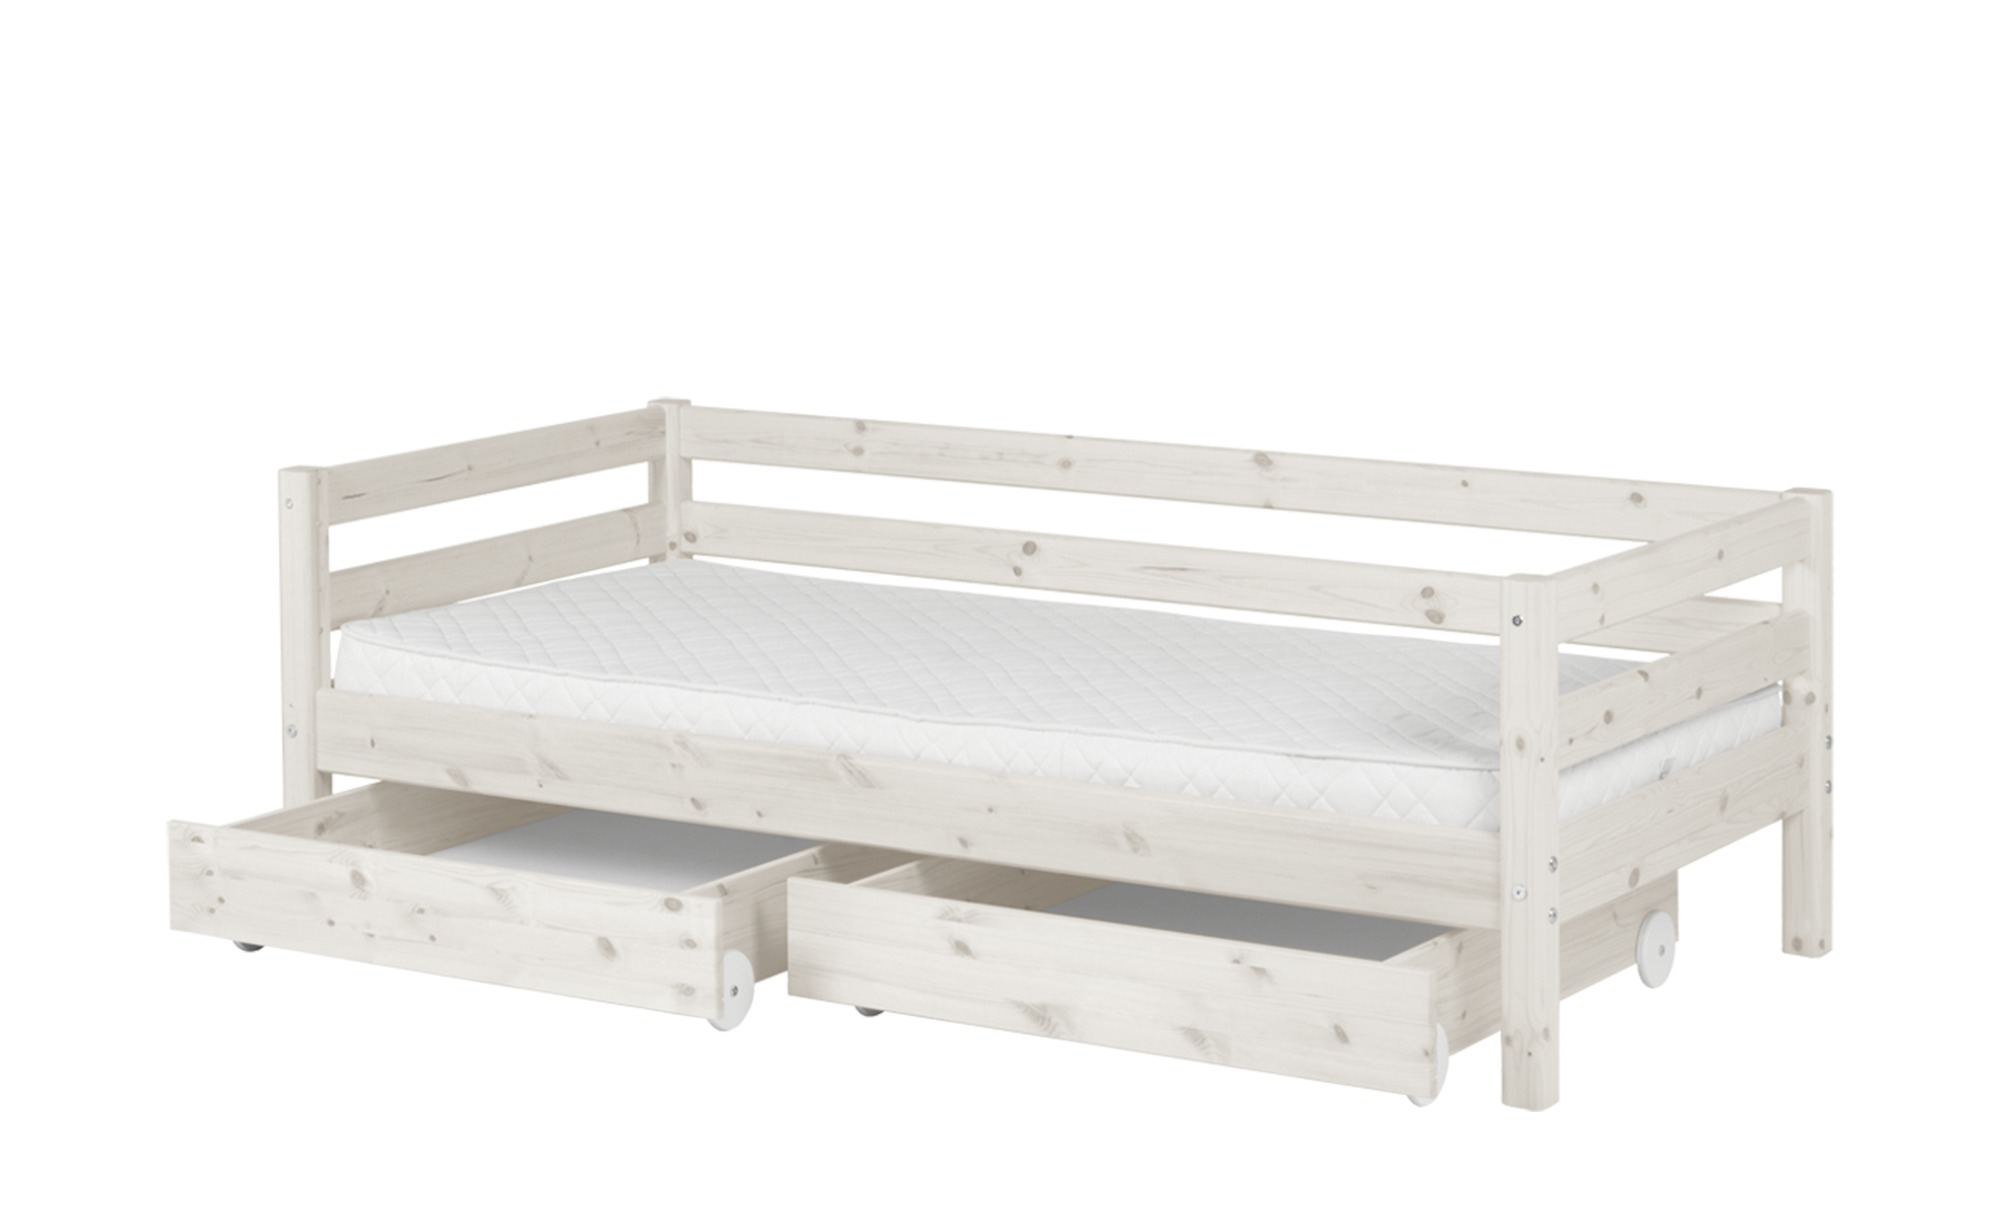 Full Size of Bett Massivholz Poco Betten Bette Badewannen Altes Weiß 90x200 2x2m Amazon Mit Stauraum 160x200 Billerbeck Aufbewahrung Komplett Ohne Kopfteil Rückwand Bett Kiefer Bett 90x200